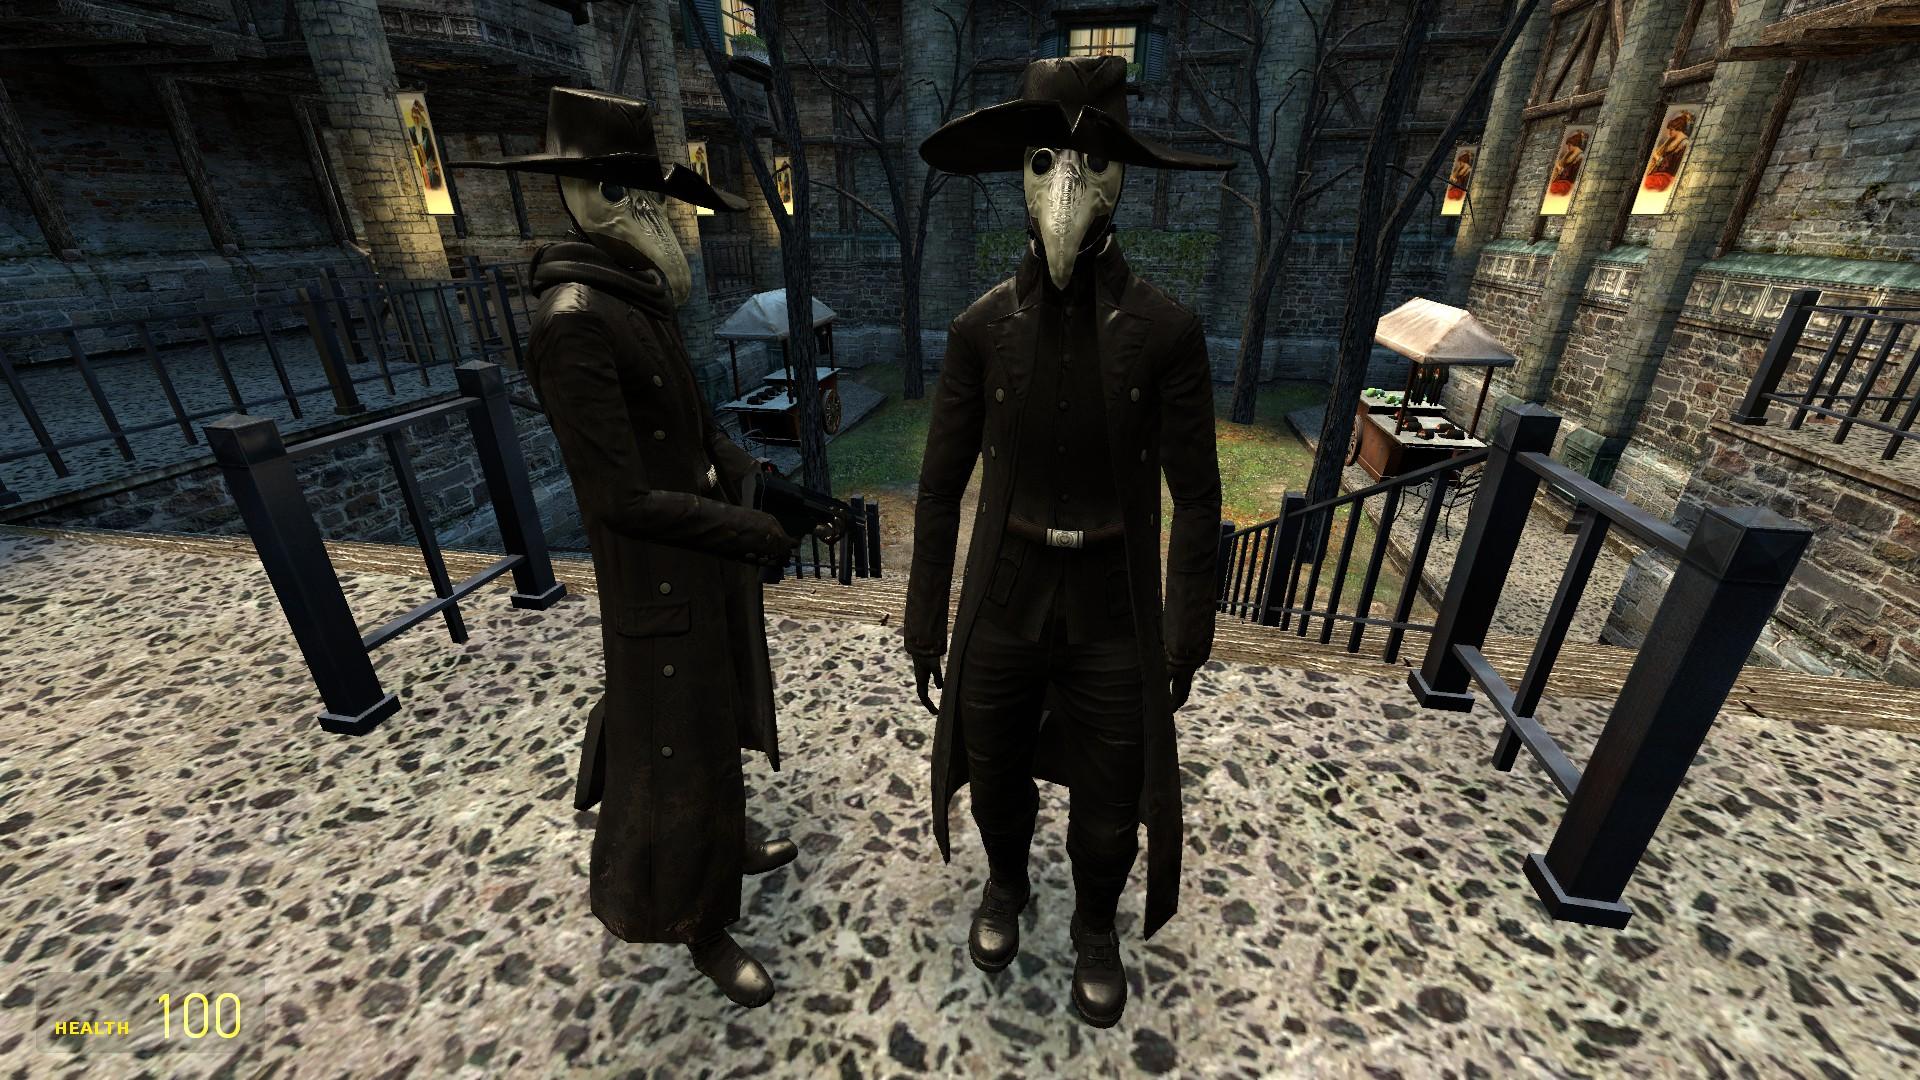 Doktor haus Player Model/NPCs file - Garrys Mod for Half-Life 2 - Mod DB